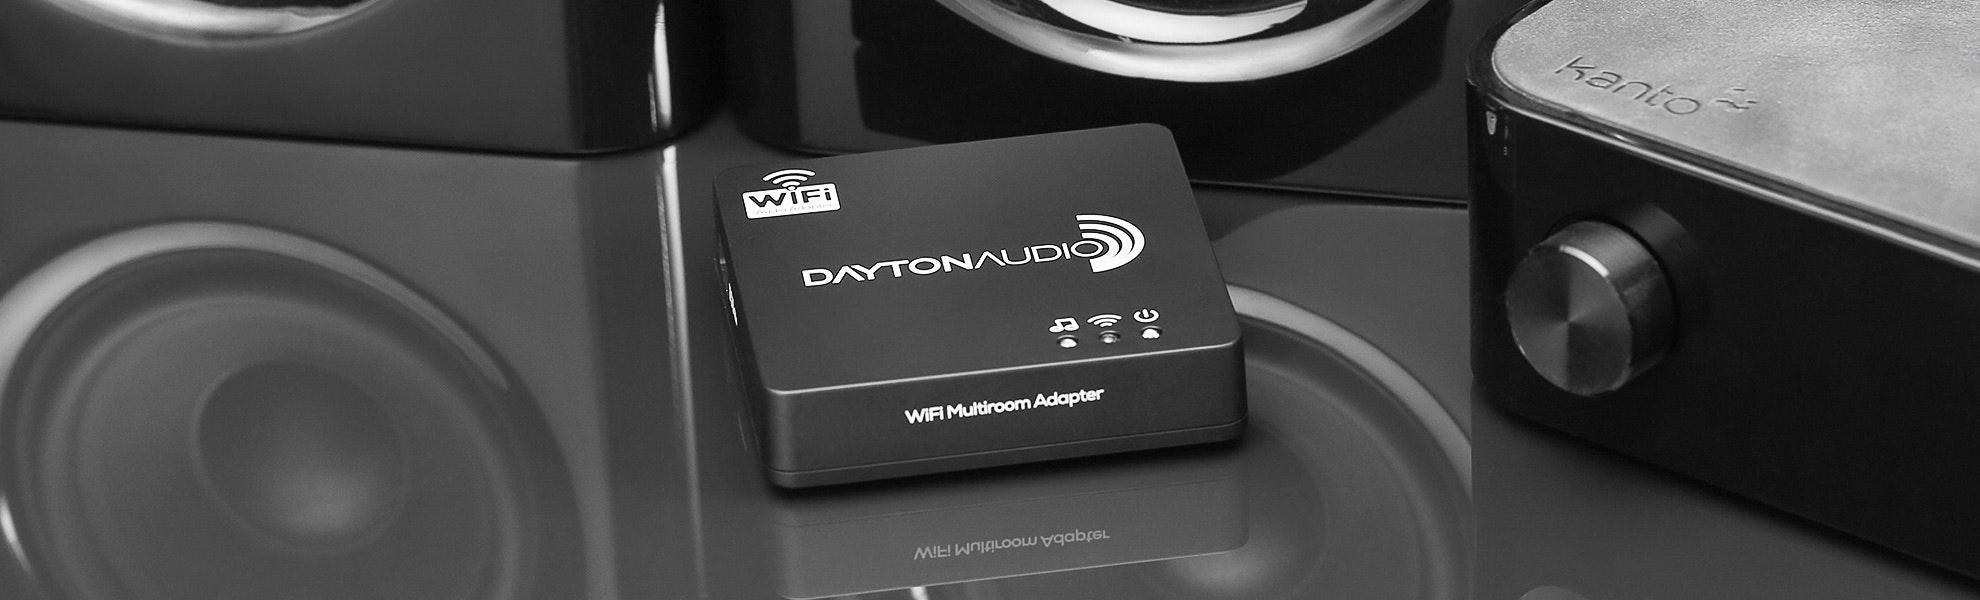 Dayton Audio Wi-Fi Multi-Room Audio Adapter